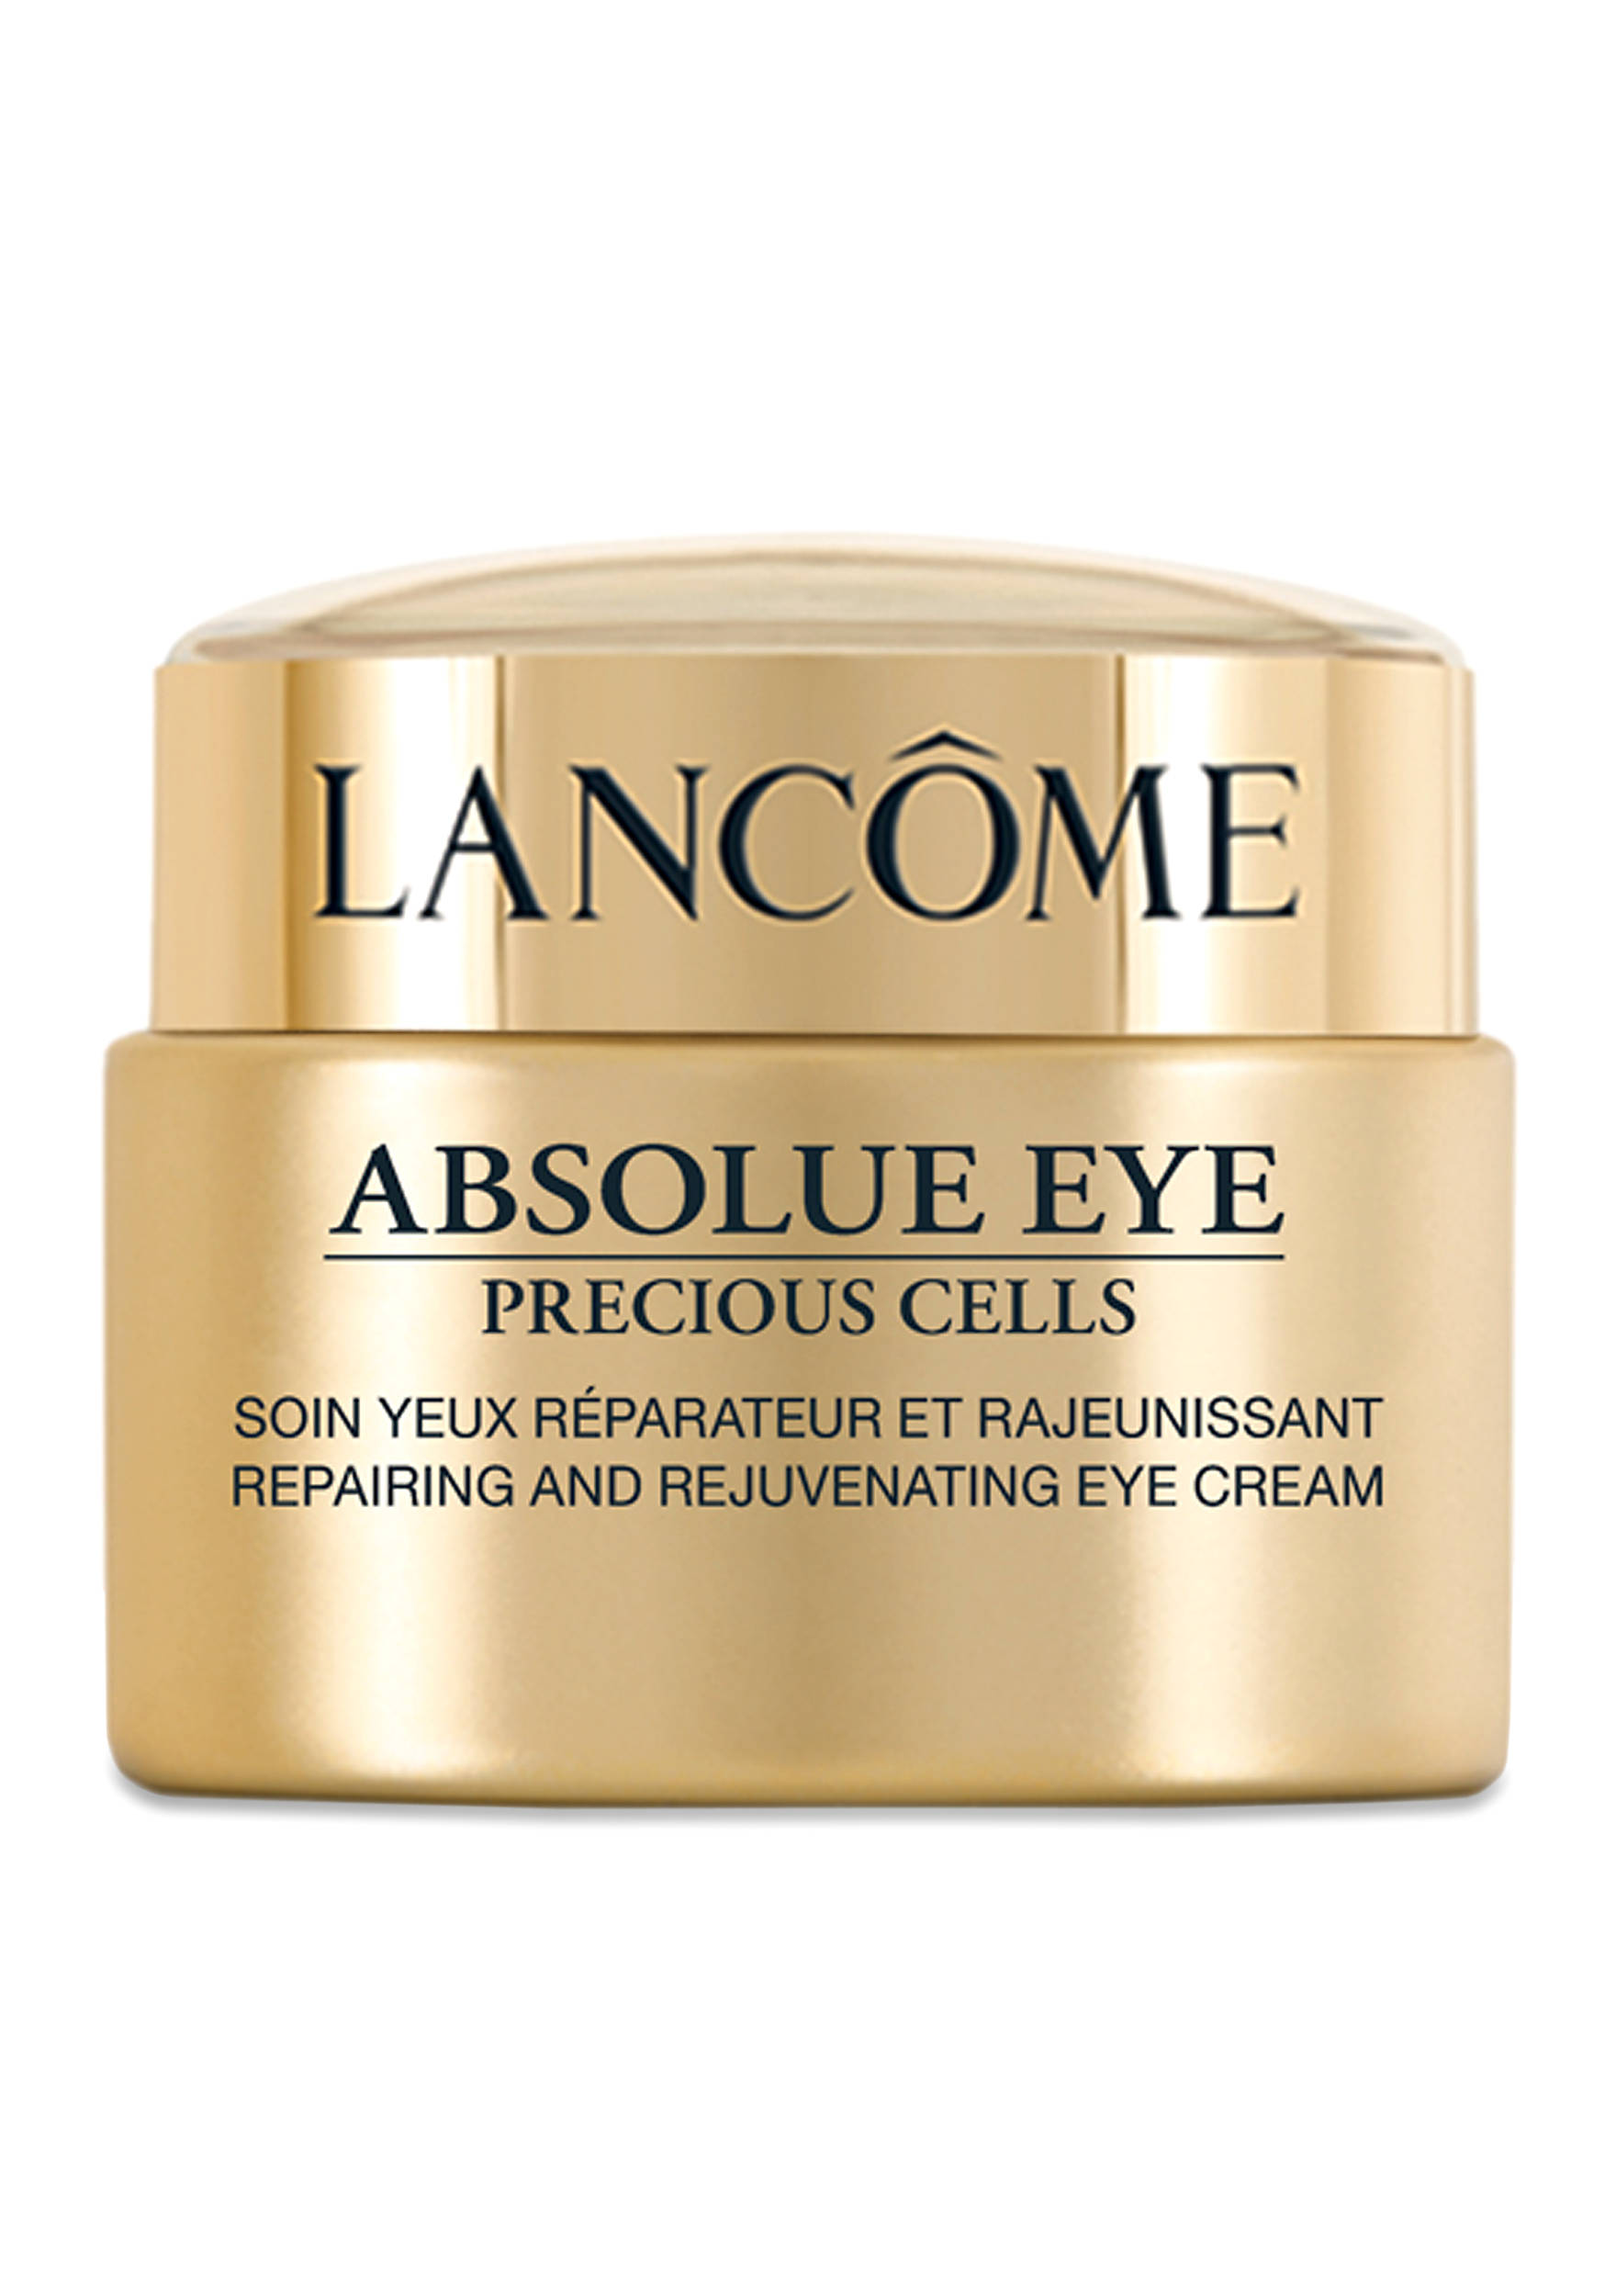 Absolue Precious Cells Nourishing Lip Balm by Lancôme #14